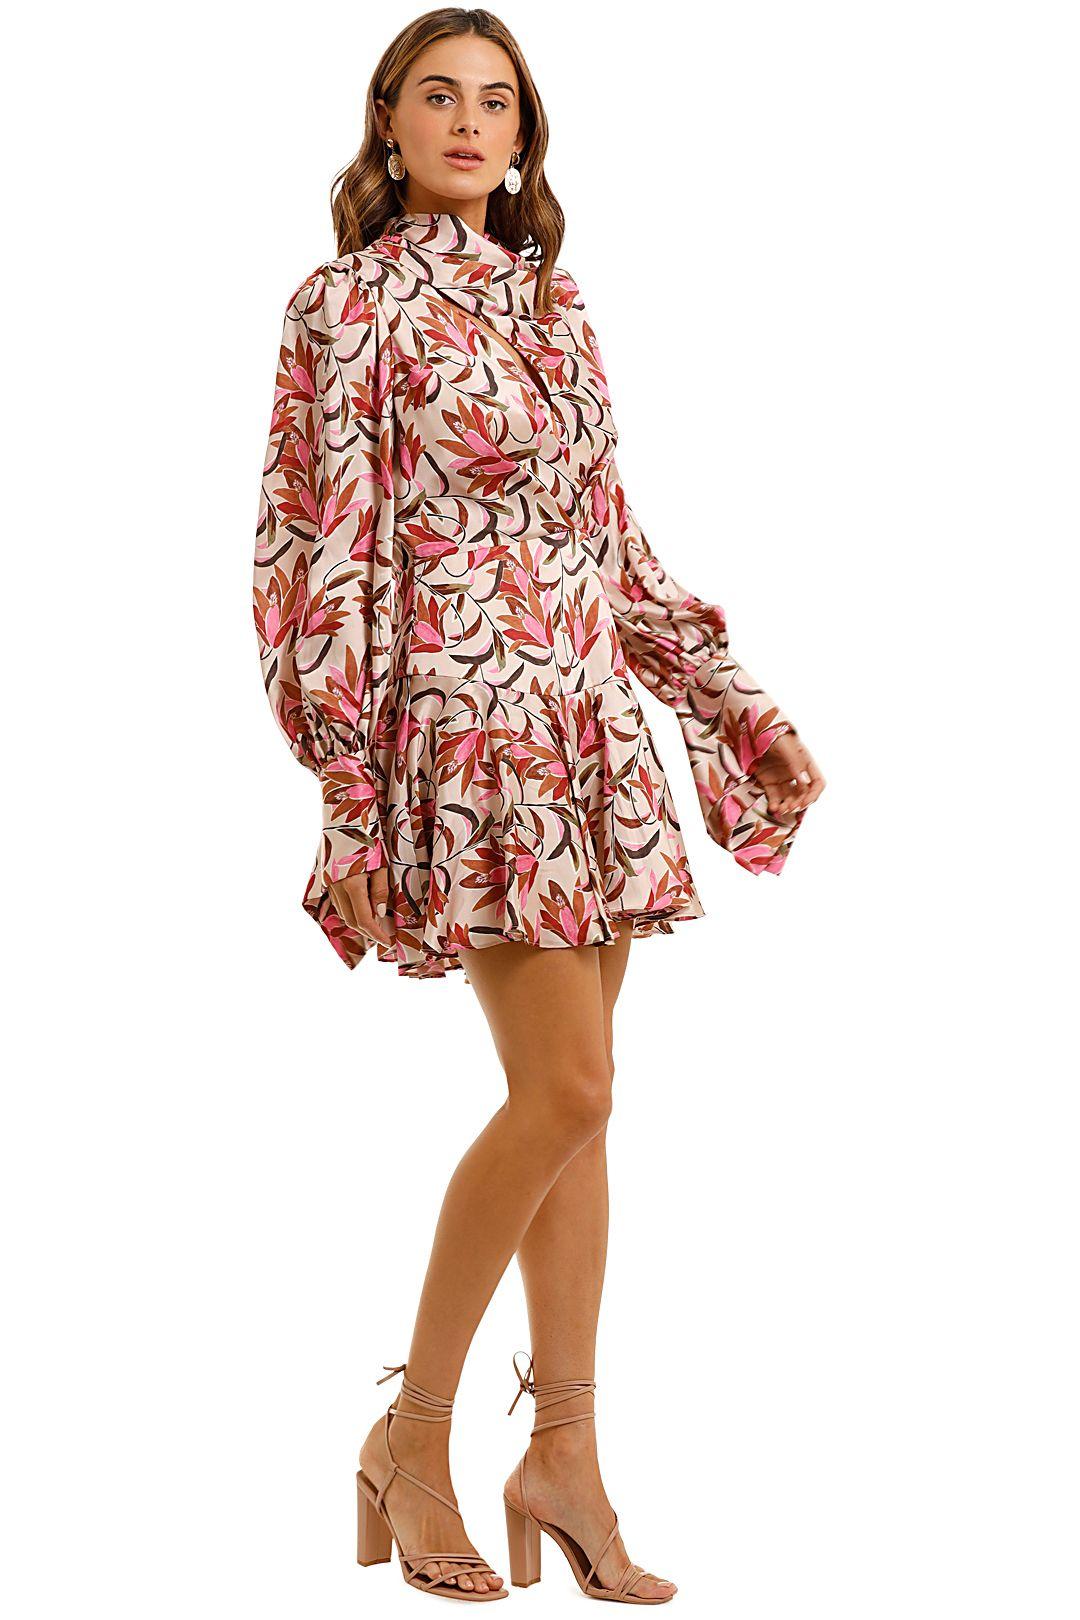 Acler Coleman Mini Dress Floral